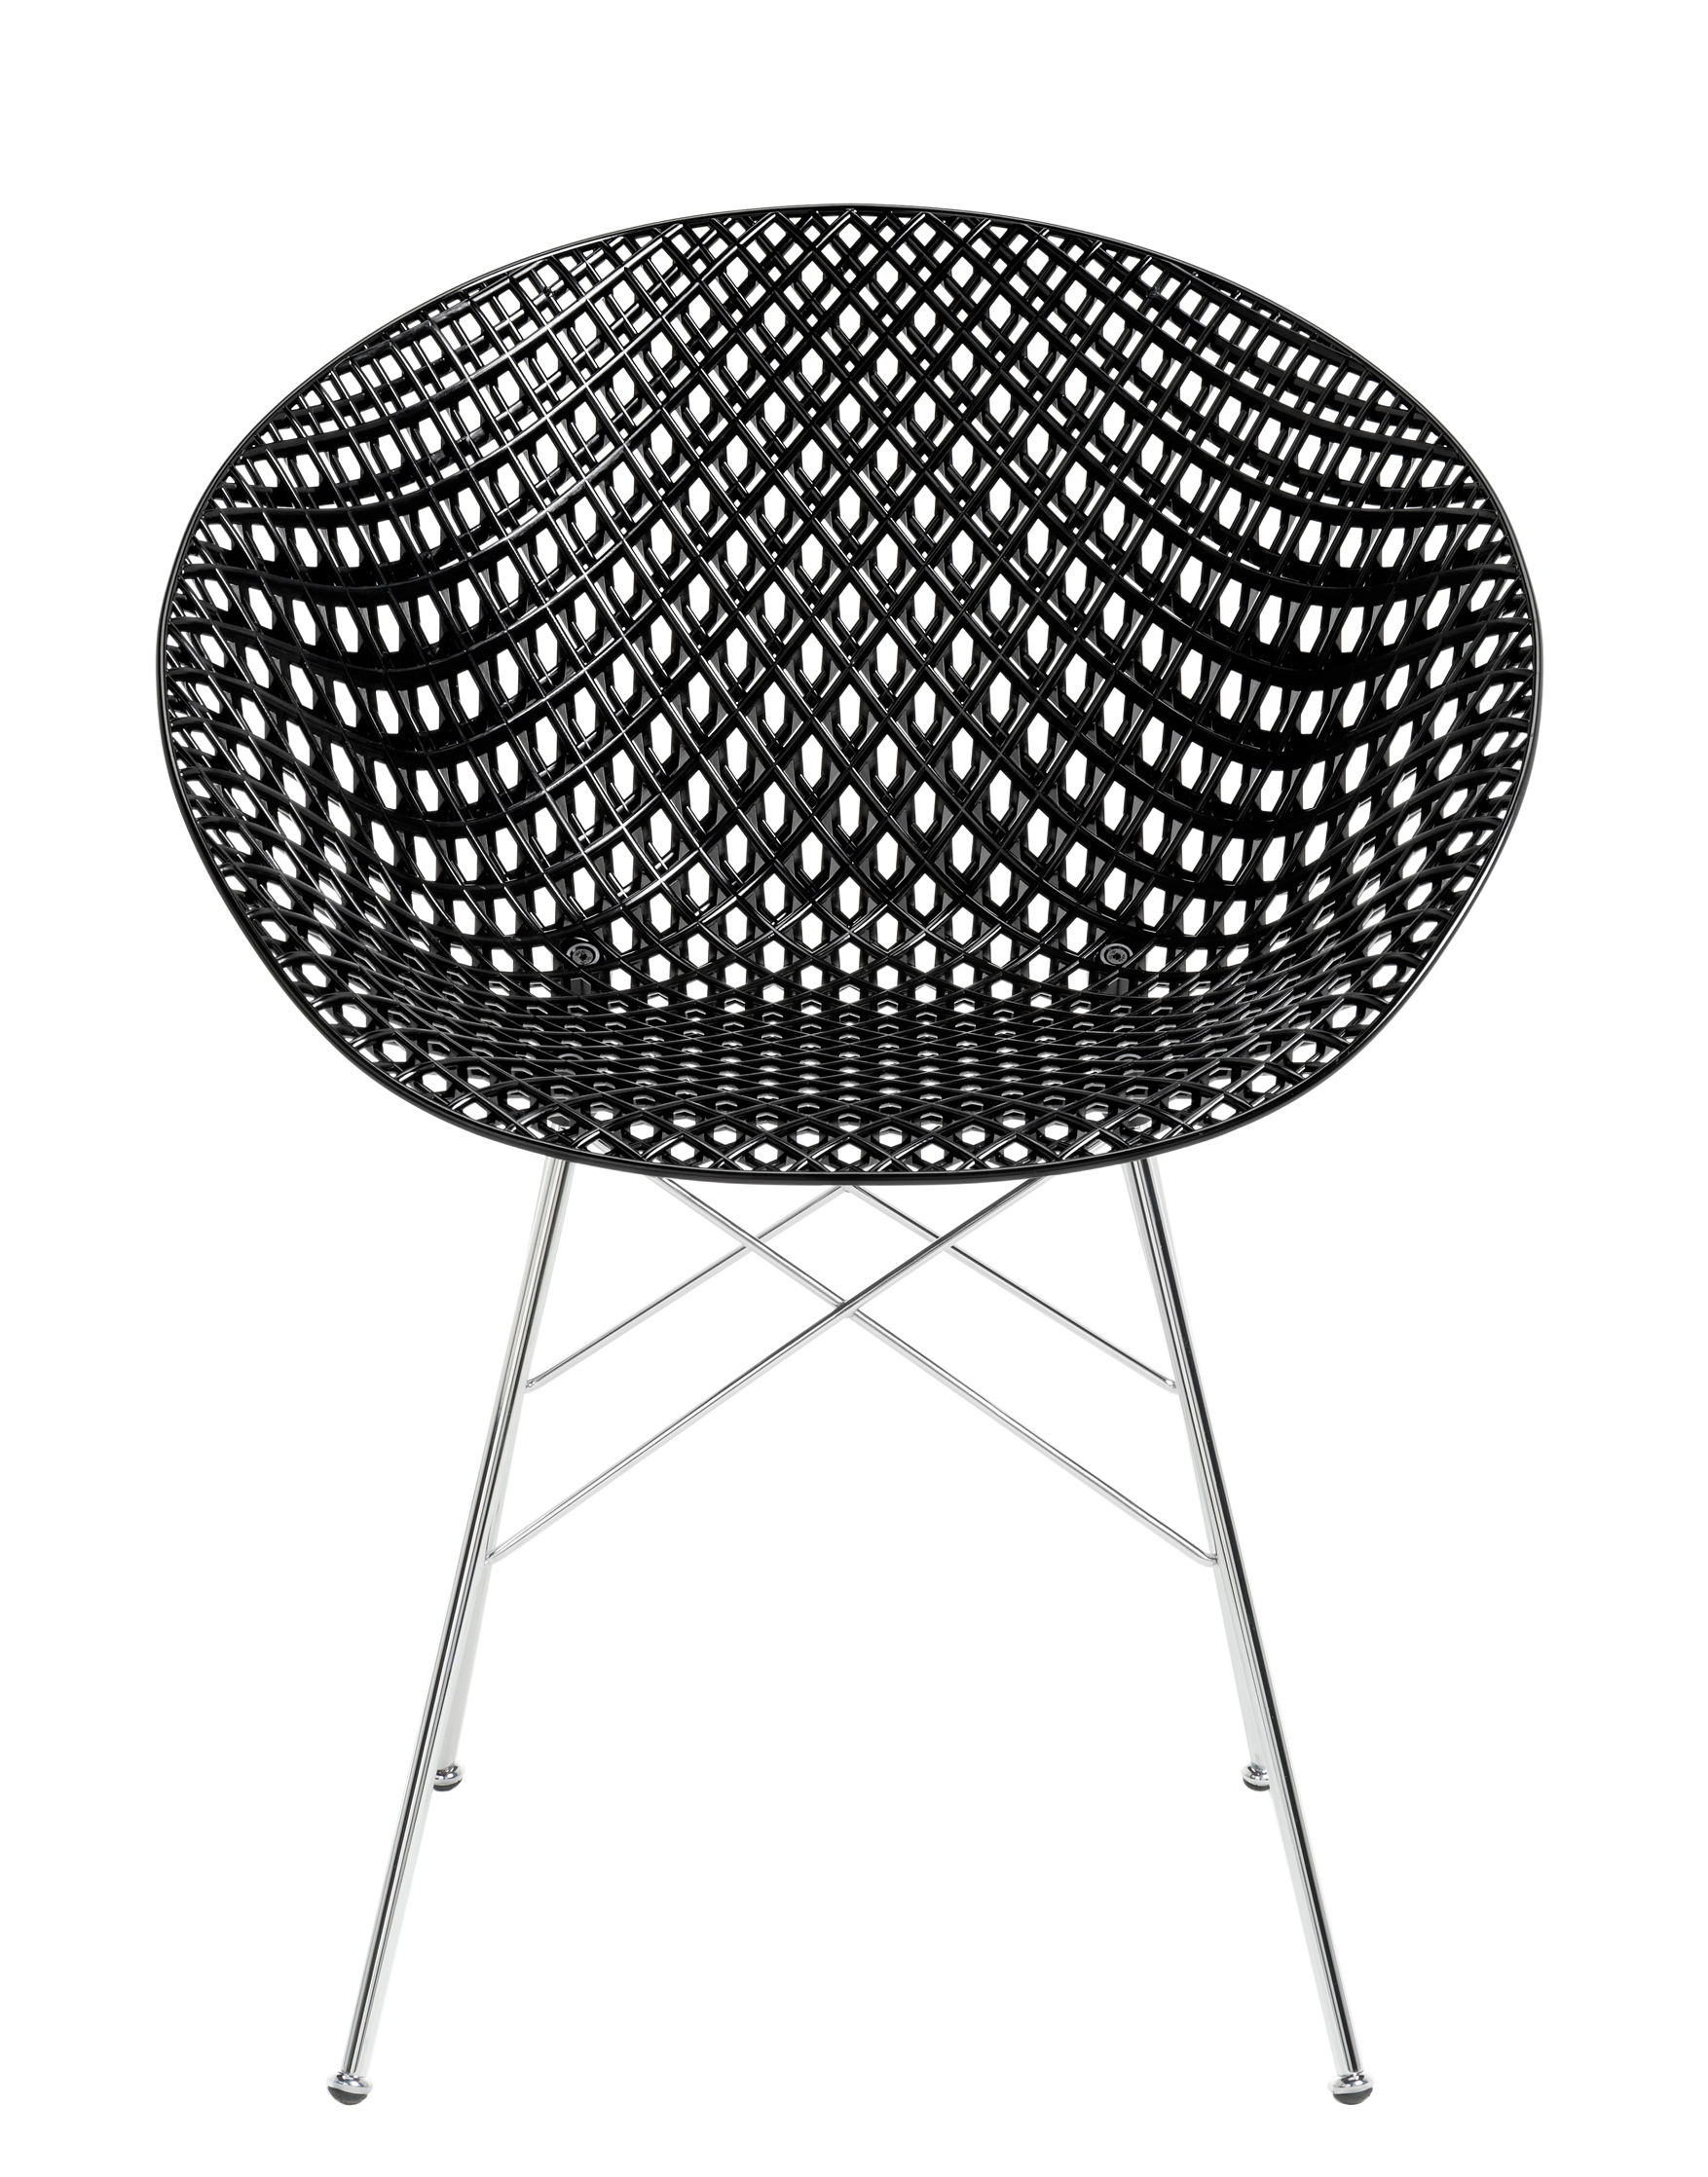 Arredamento - Sedie  - Poltrona Smatrik - / Seduta plastica & gambe metallo di Kartell - Nero / Cromato - Acciaio cromato, policarbonato